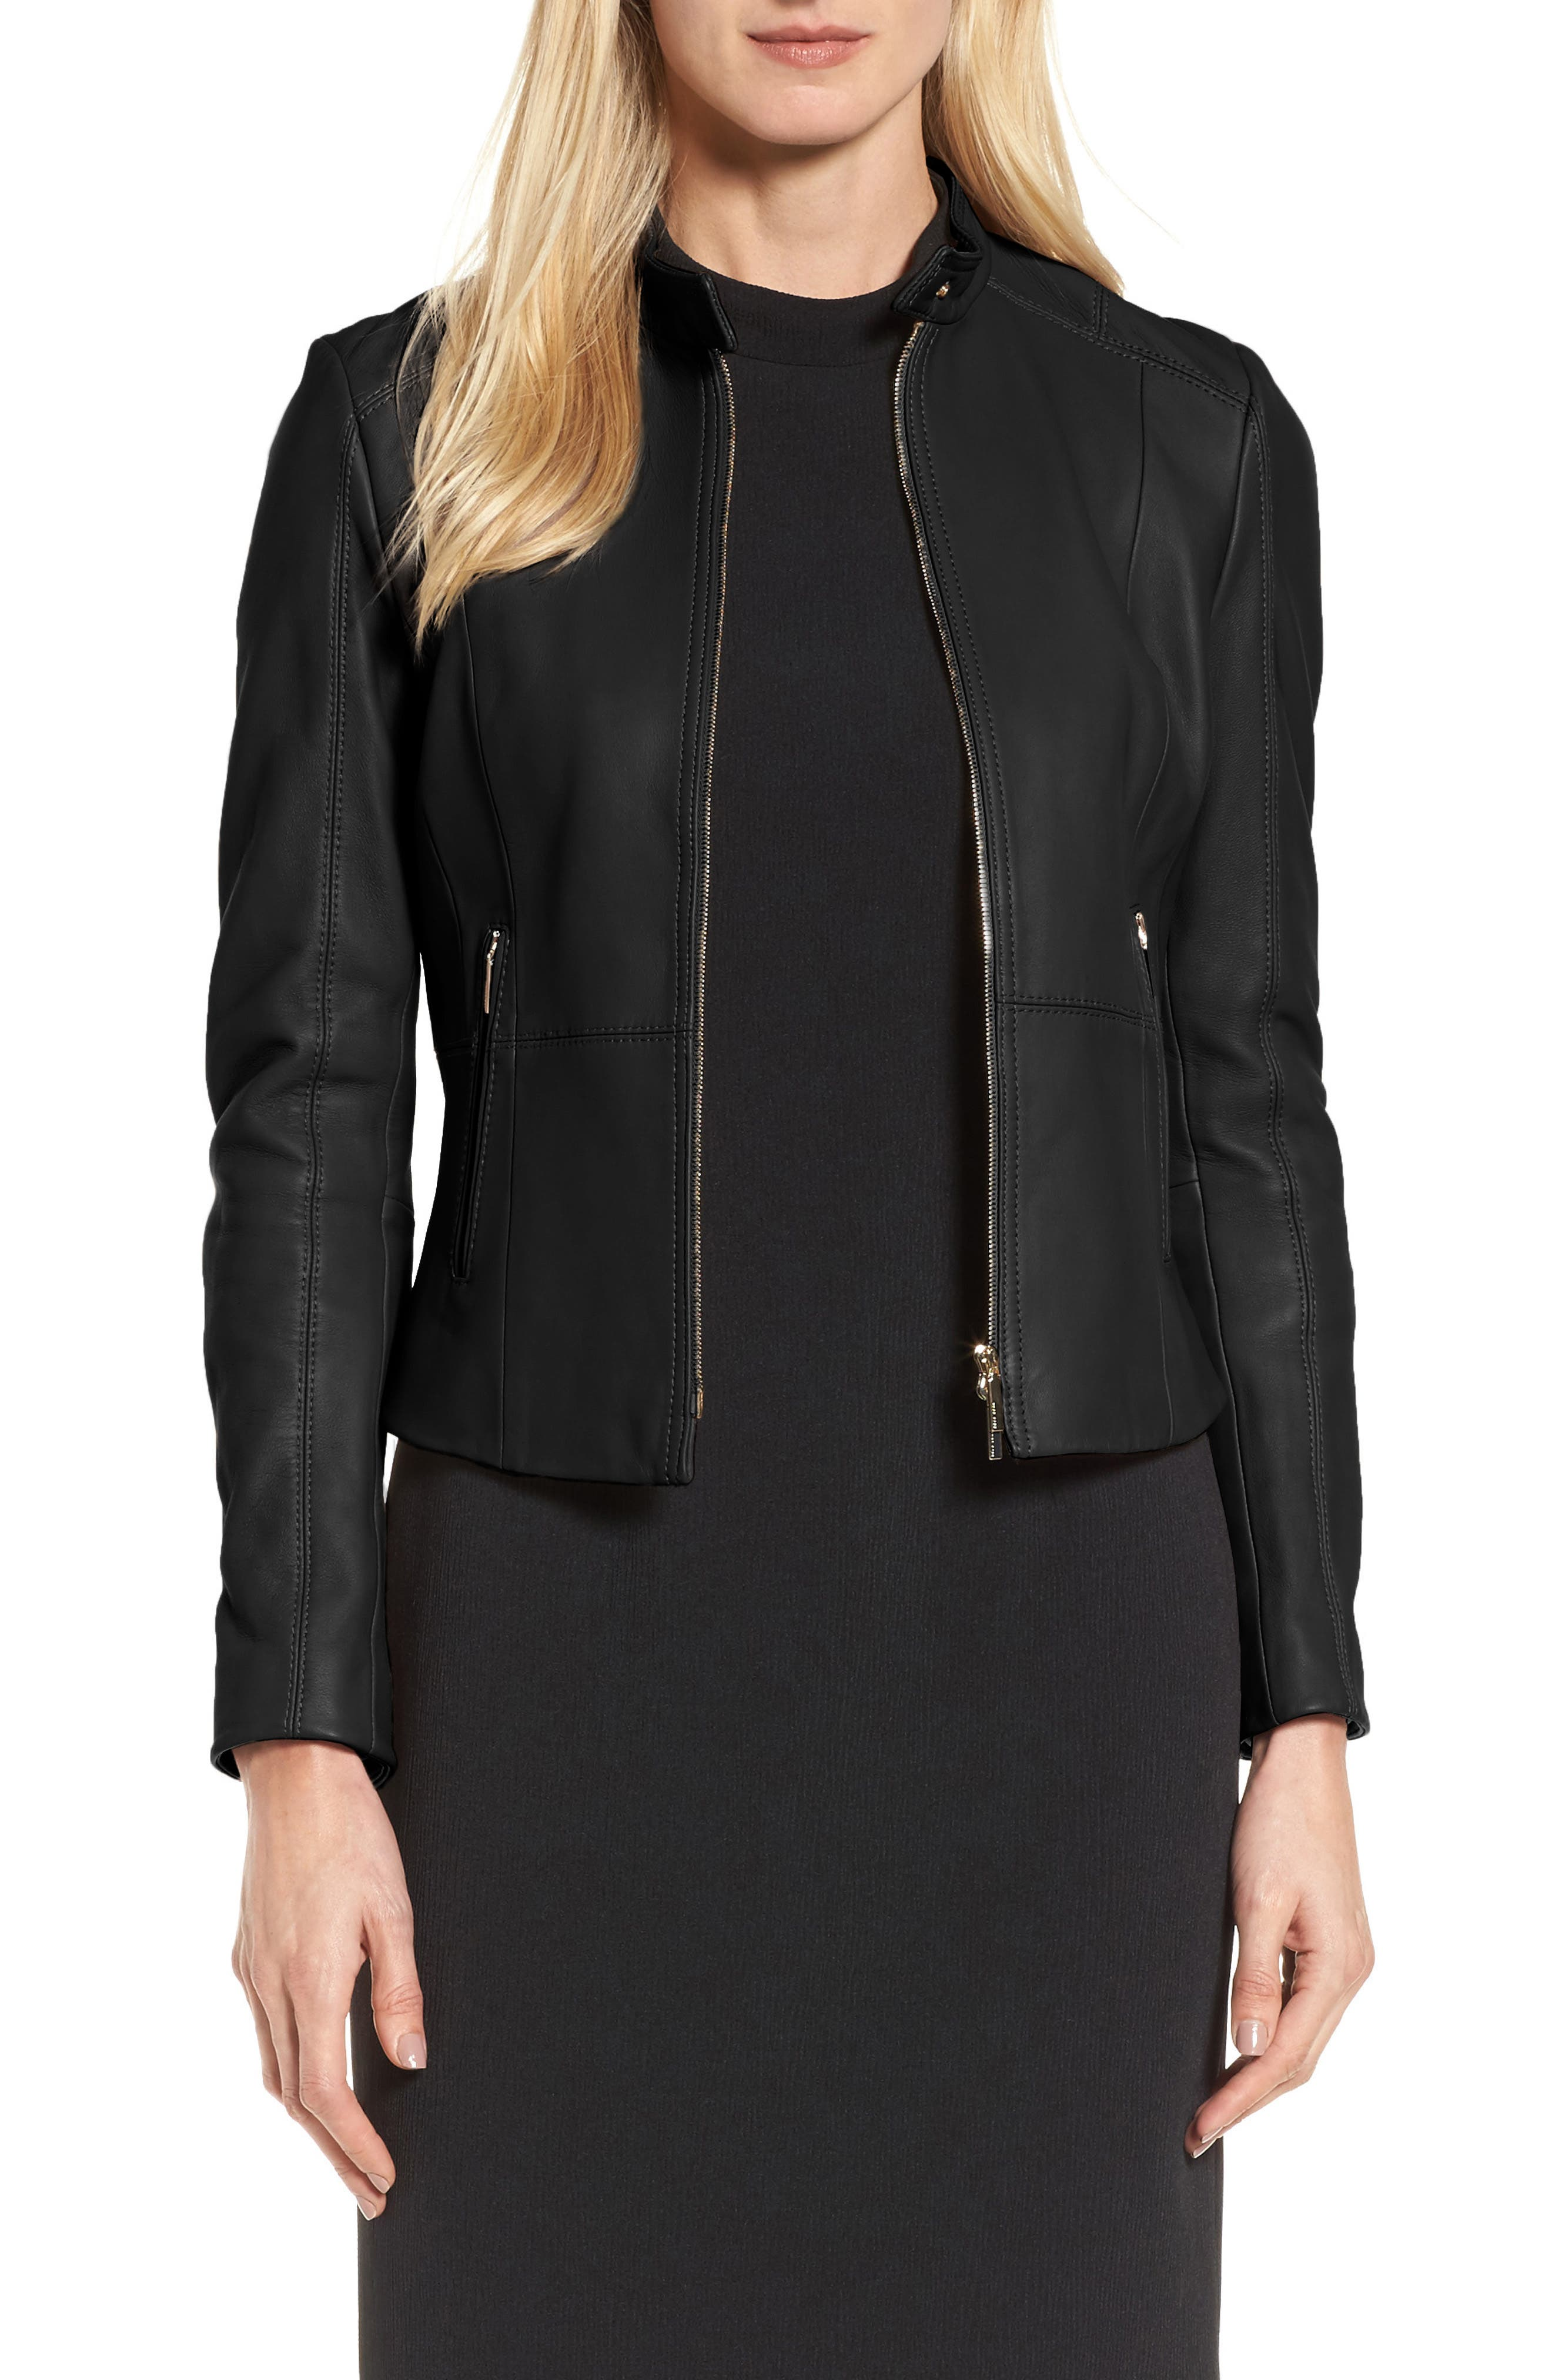 Sammonaie Leather Jacket,                         Main,                         color,